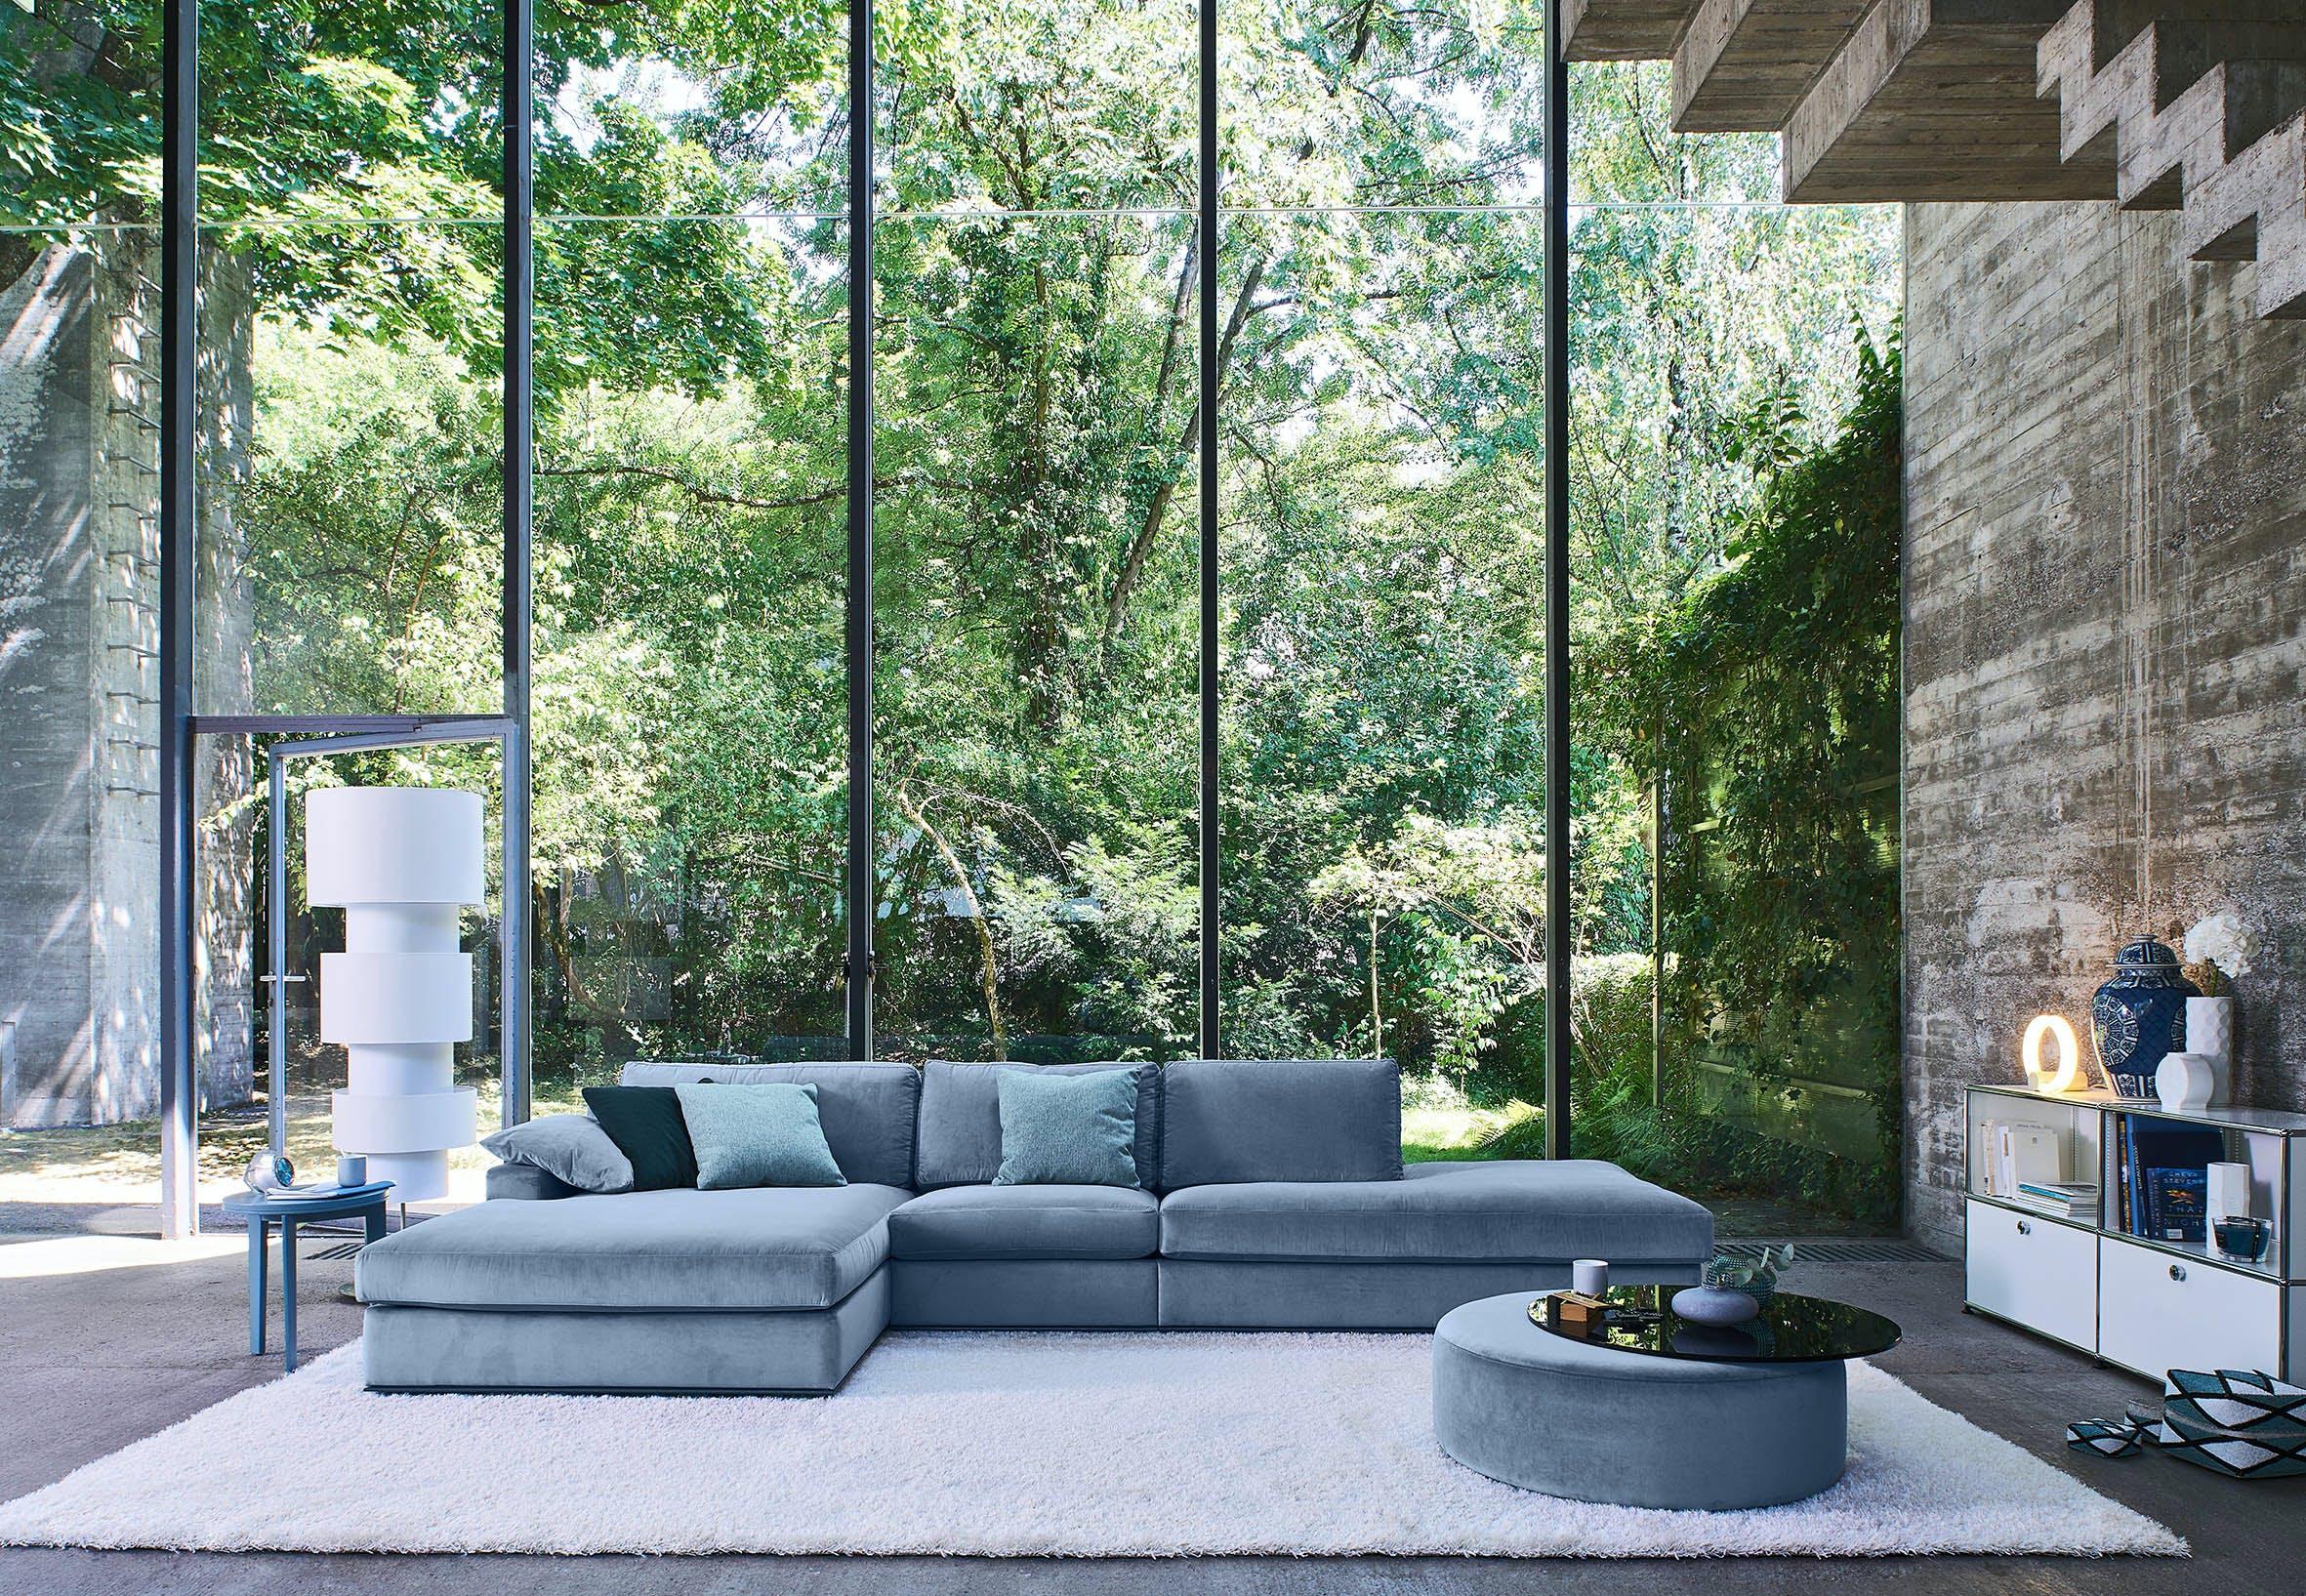 Jab Anstoetz Blue Inspiration Modular Sofa Insitu Haute Living